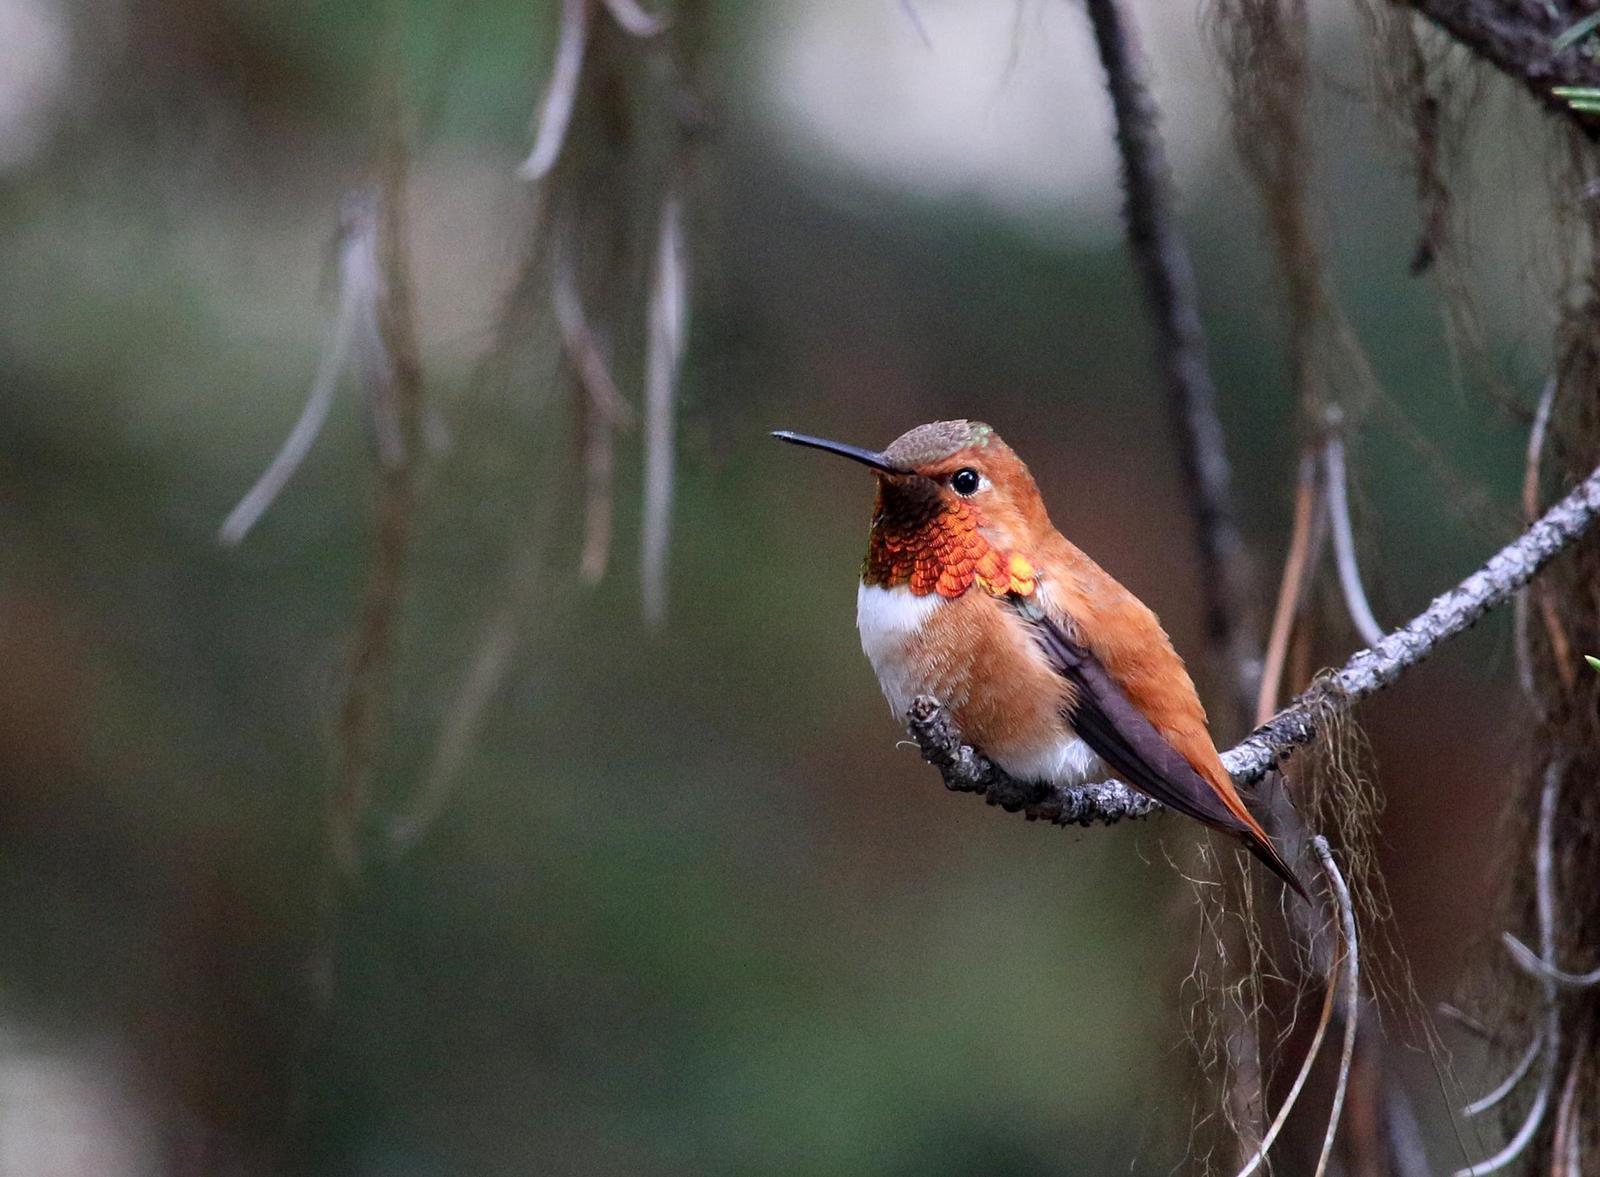 Rufous Hummingbird Photo by Roblyn Brown